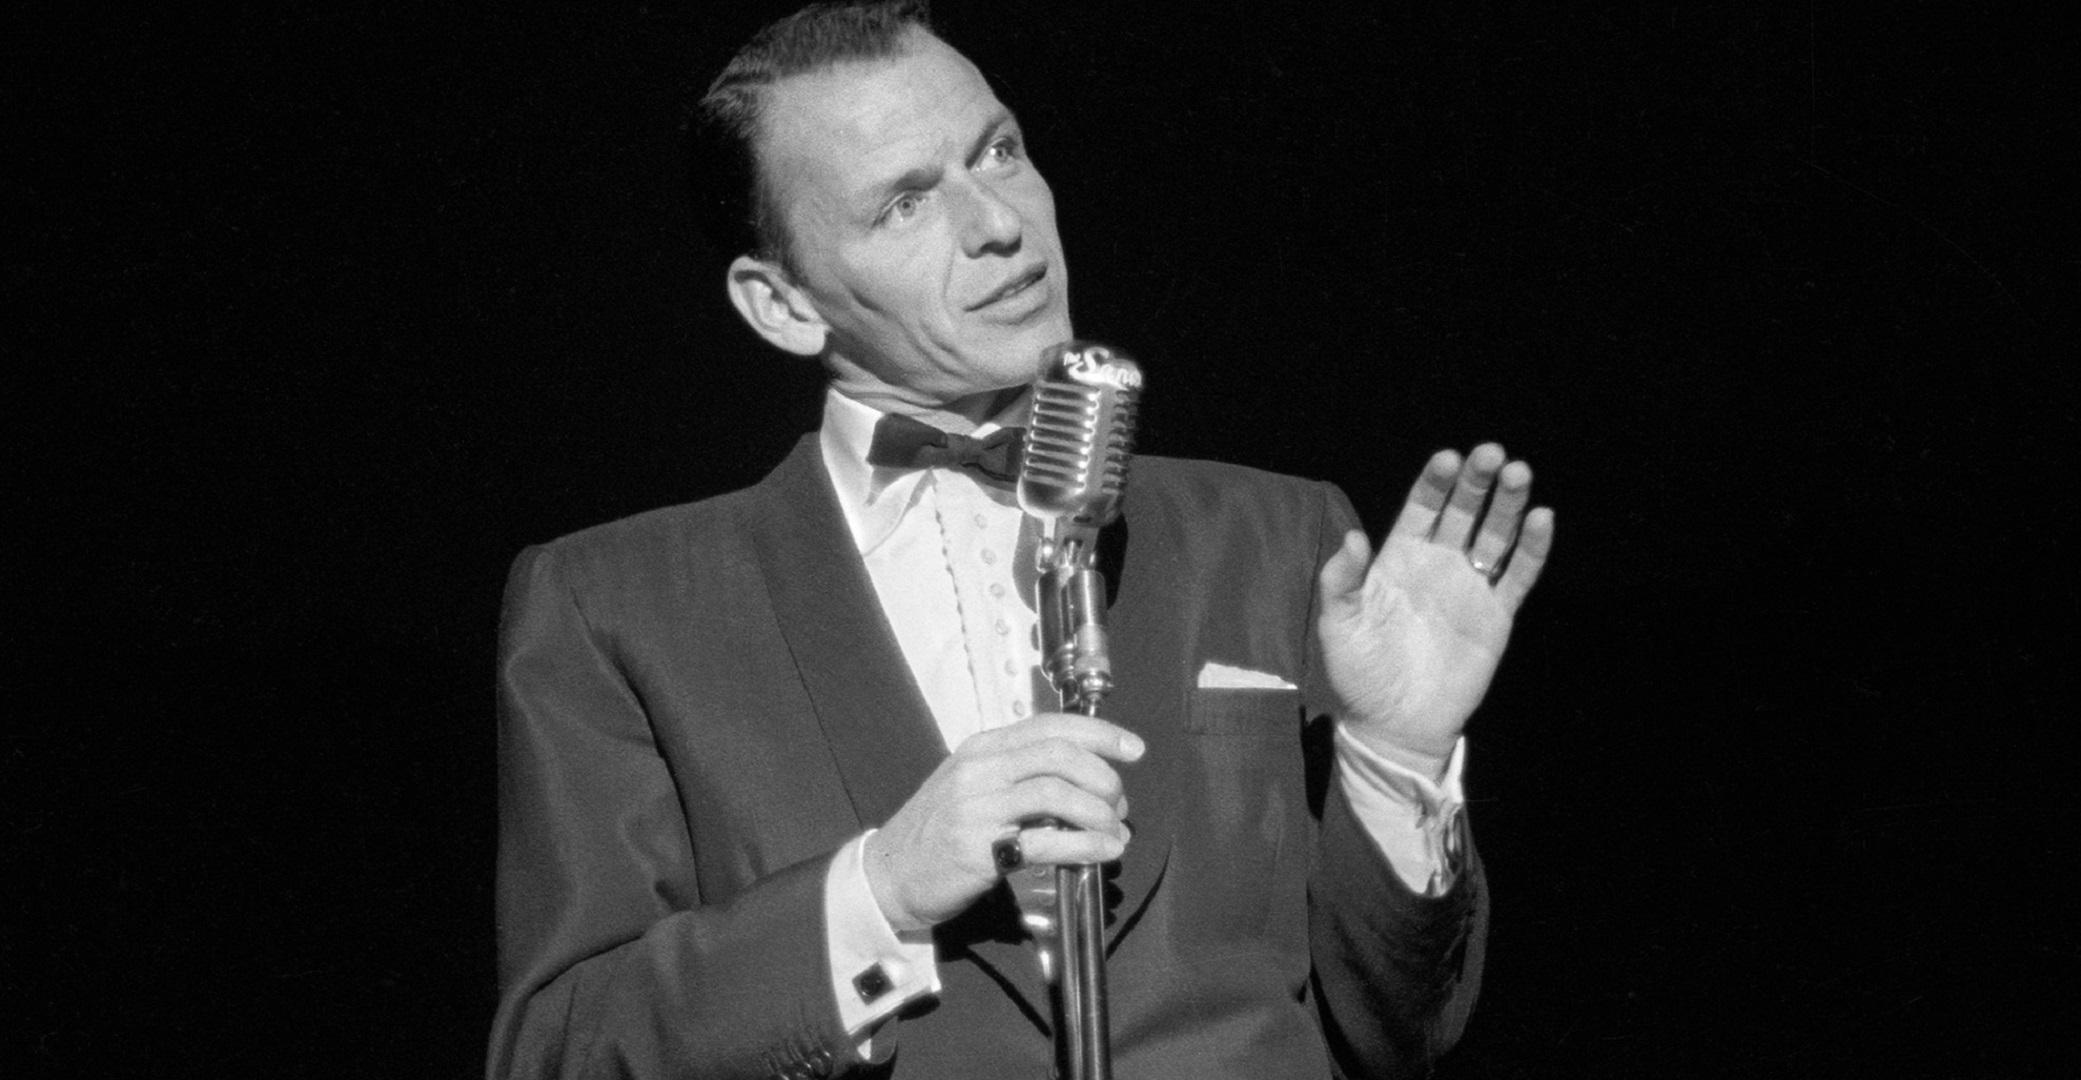 Frank Sinatra Hd Wallpaper